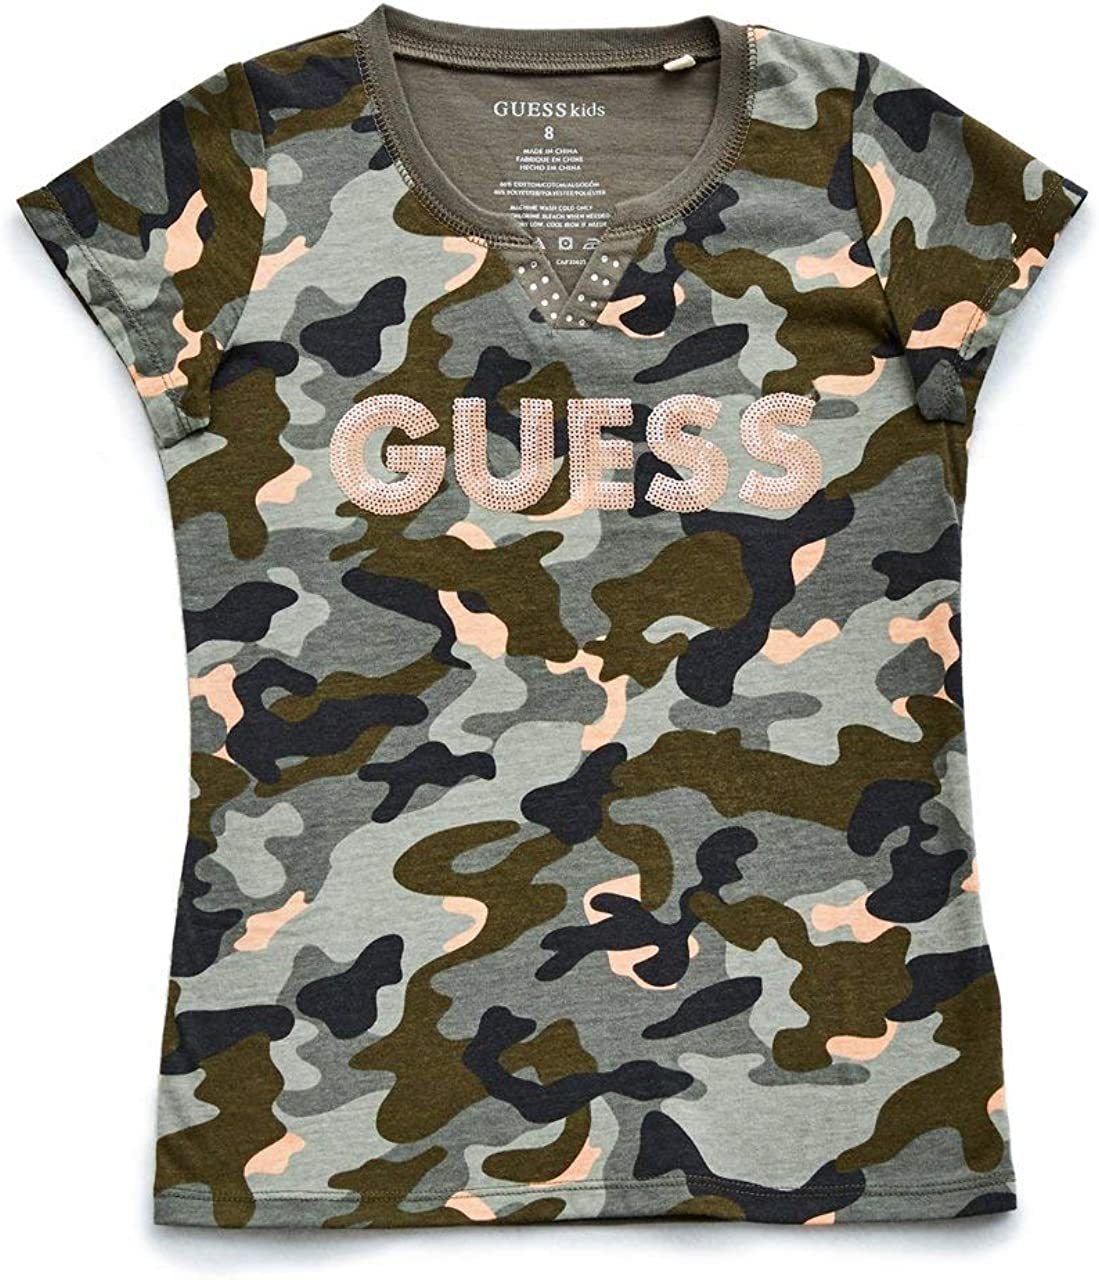 7-16 GUESS Factory Kids Girls Brielle Ruffle Sweater